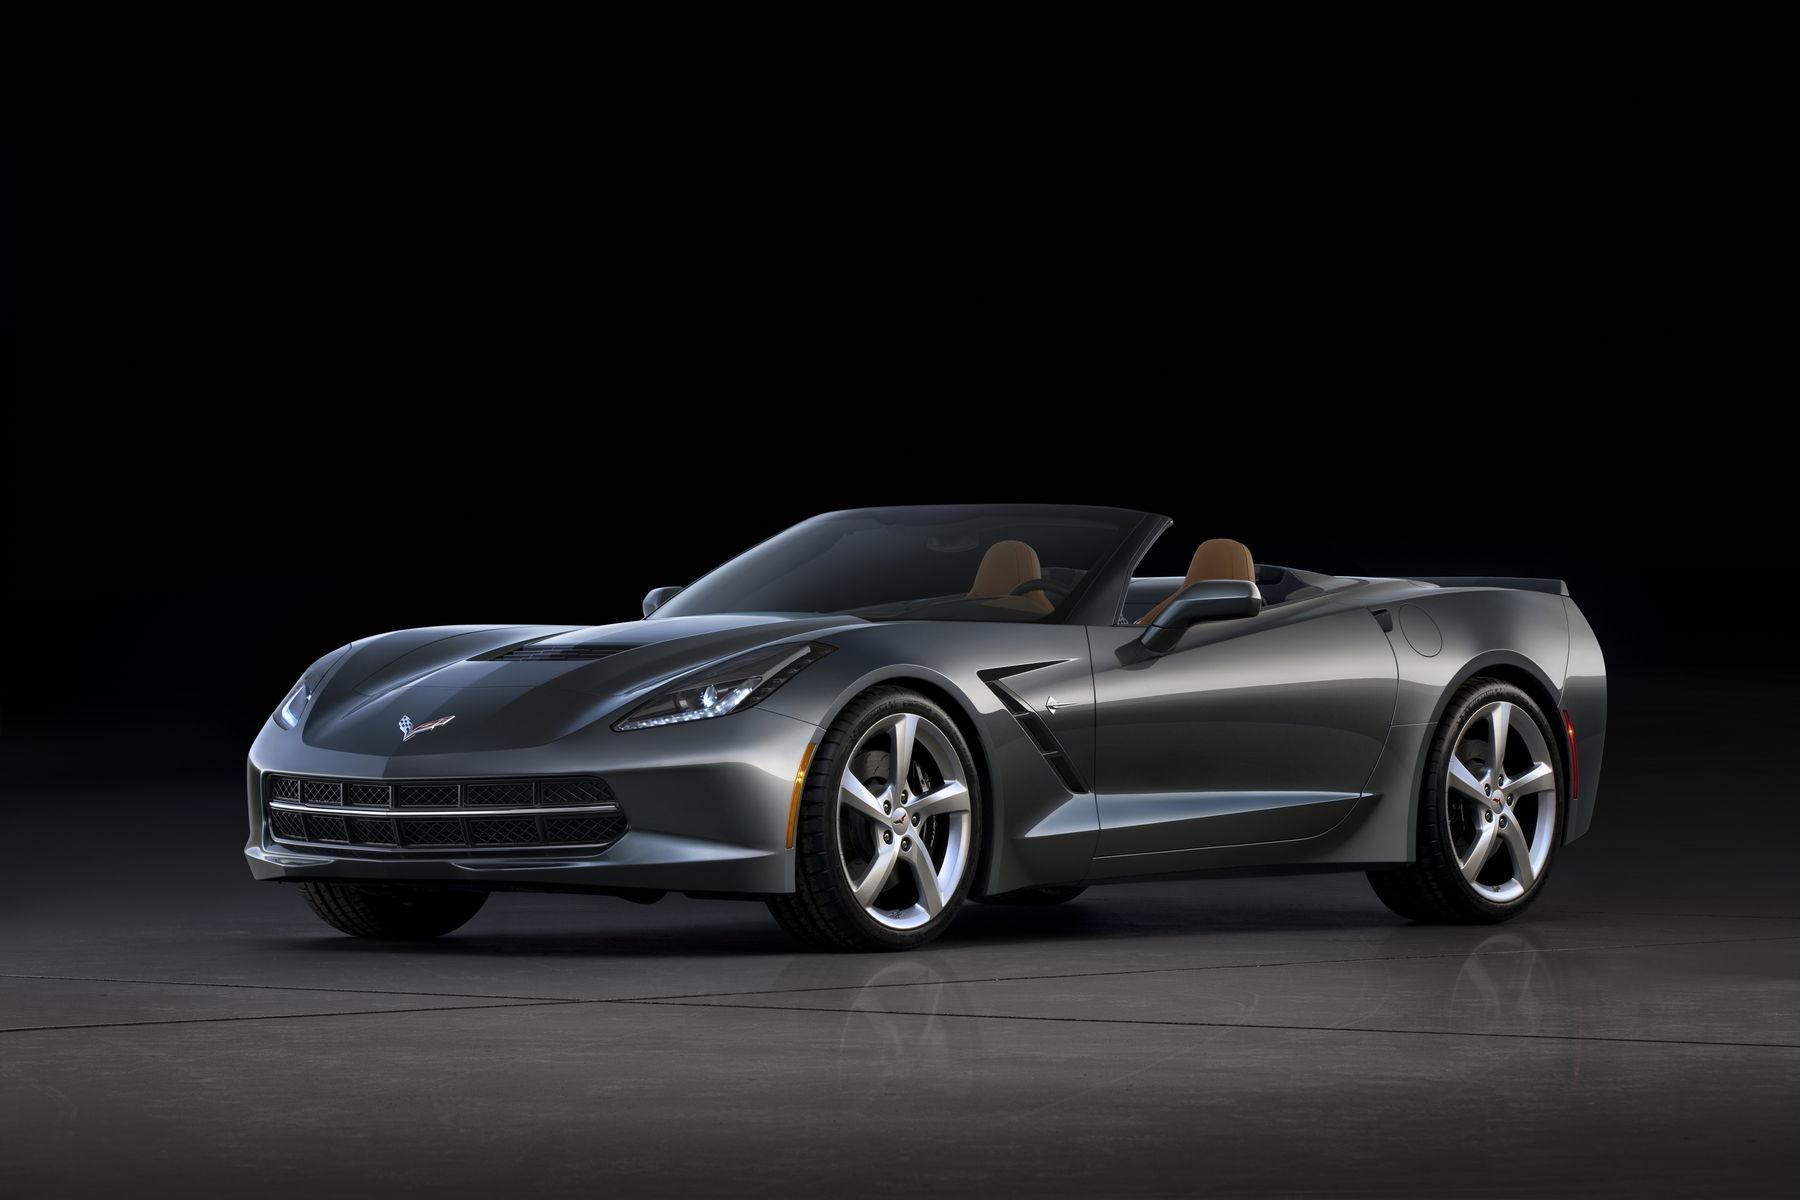 2015 Chevrolet Corvette Stingray | 2015 Corvette Stingray